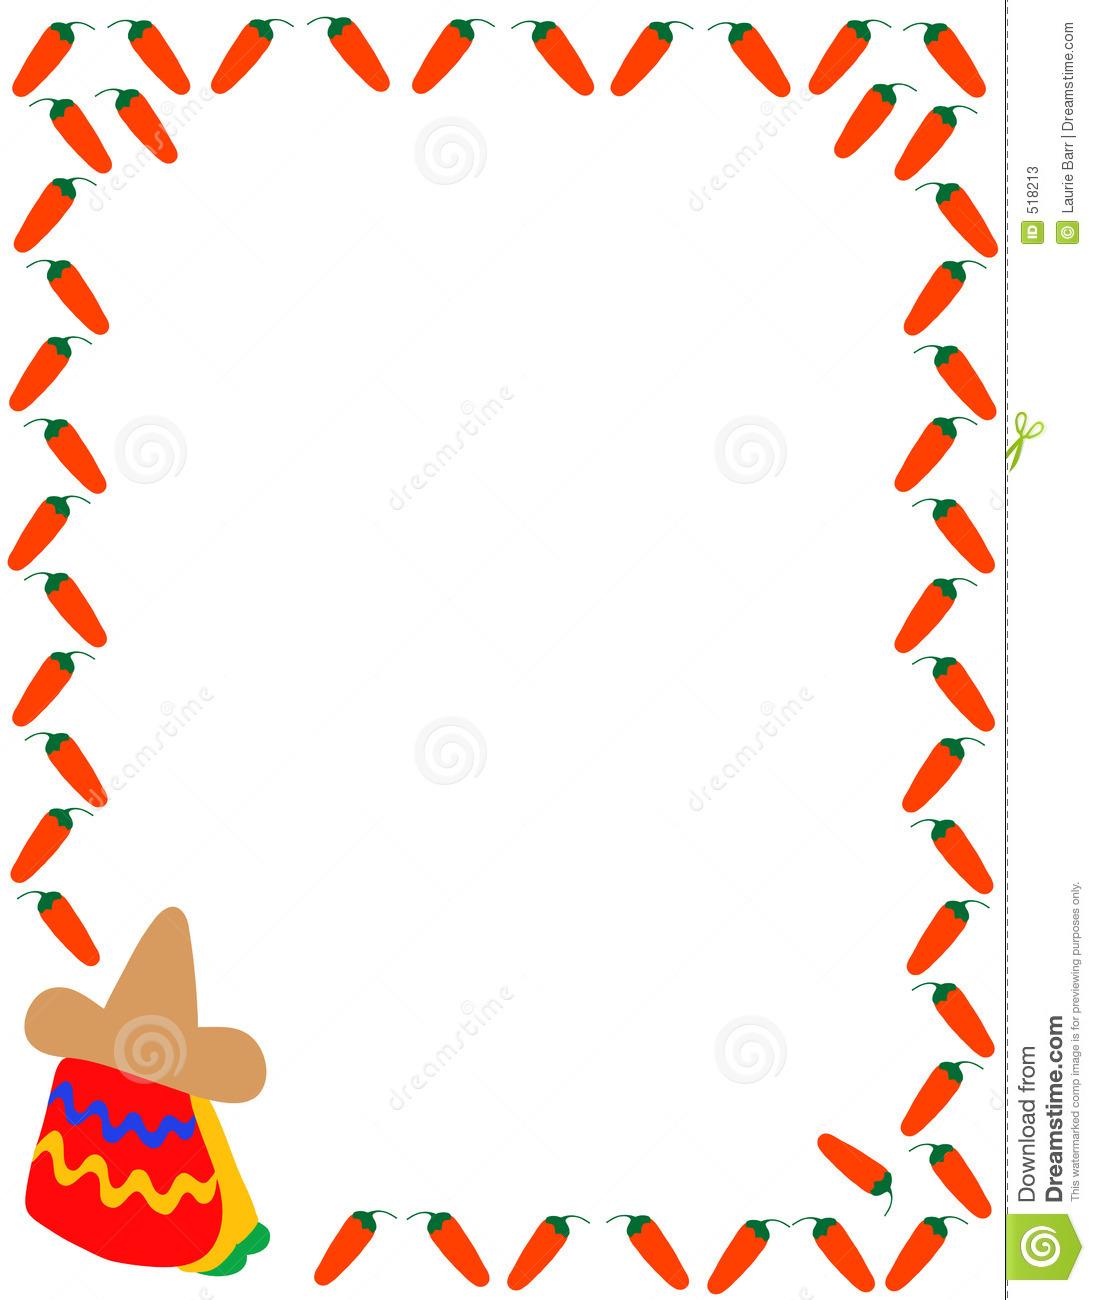 1095x1300 Mexican Food Border Clipart